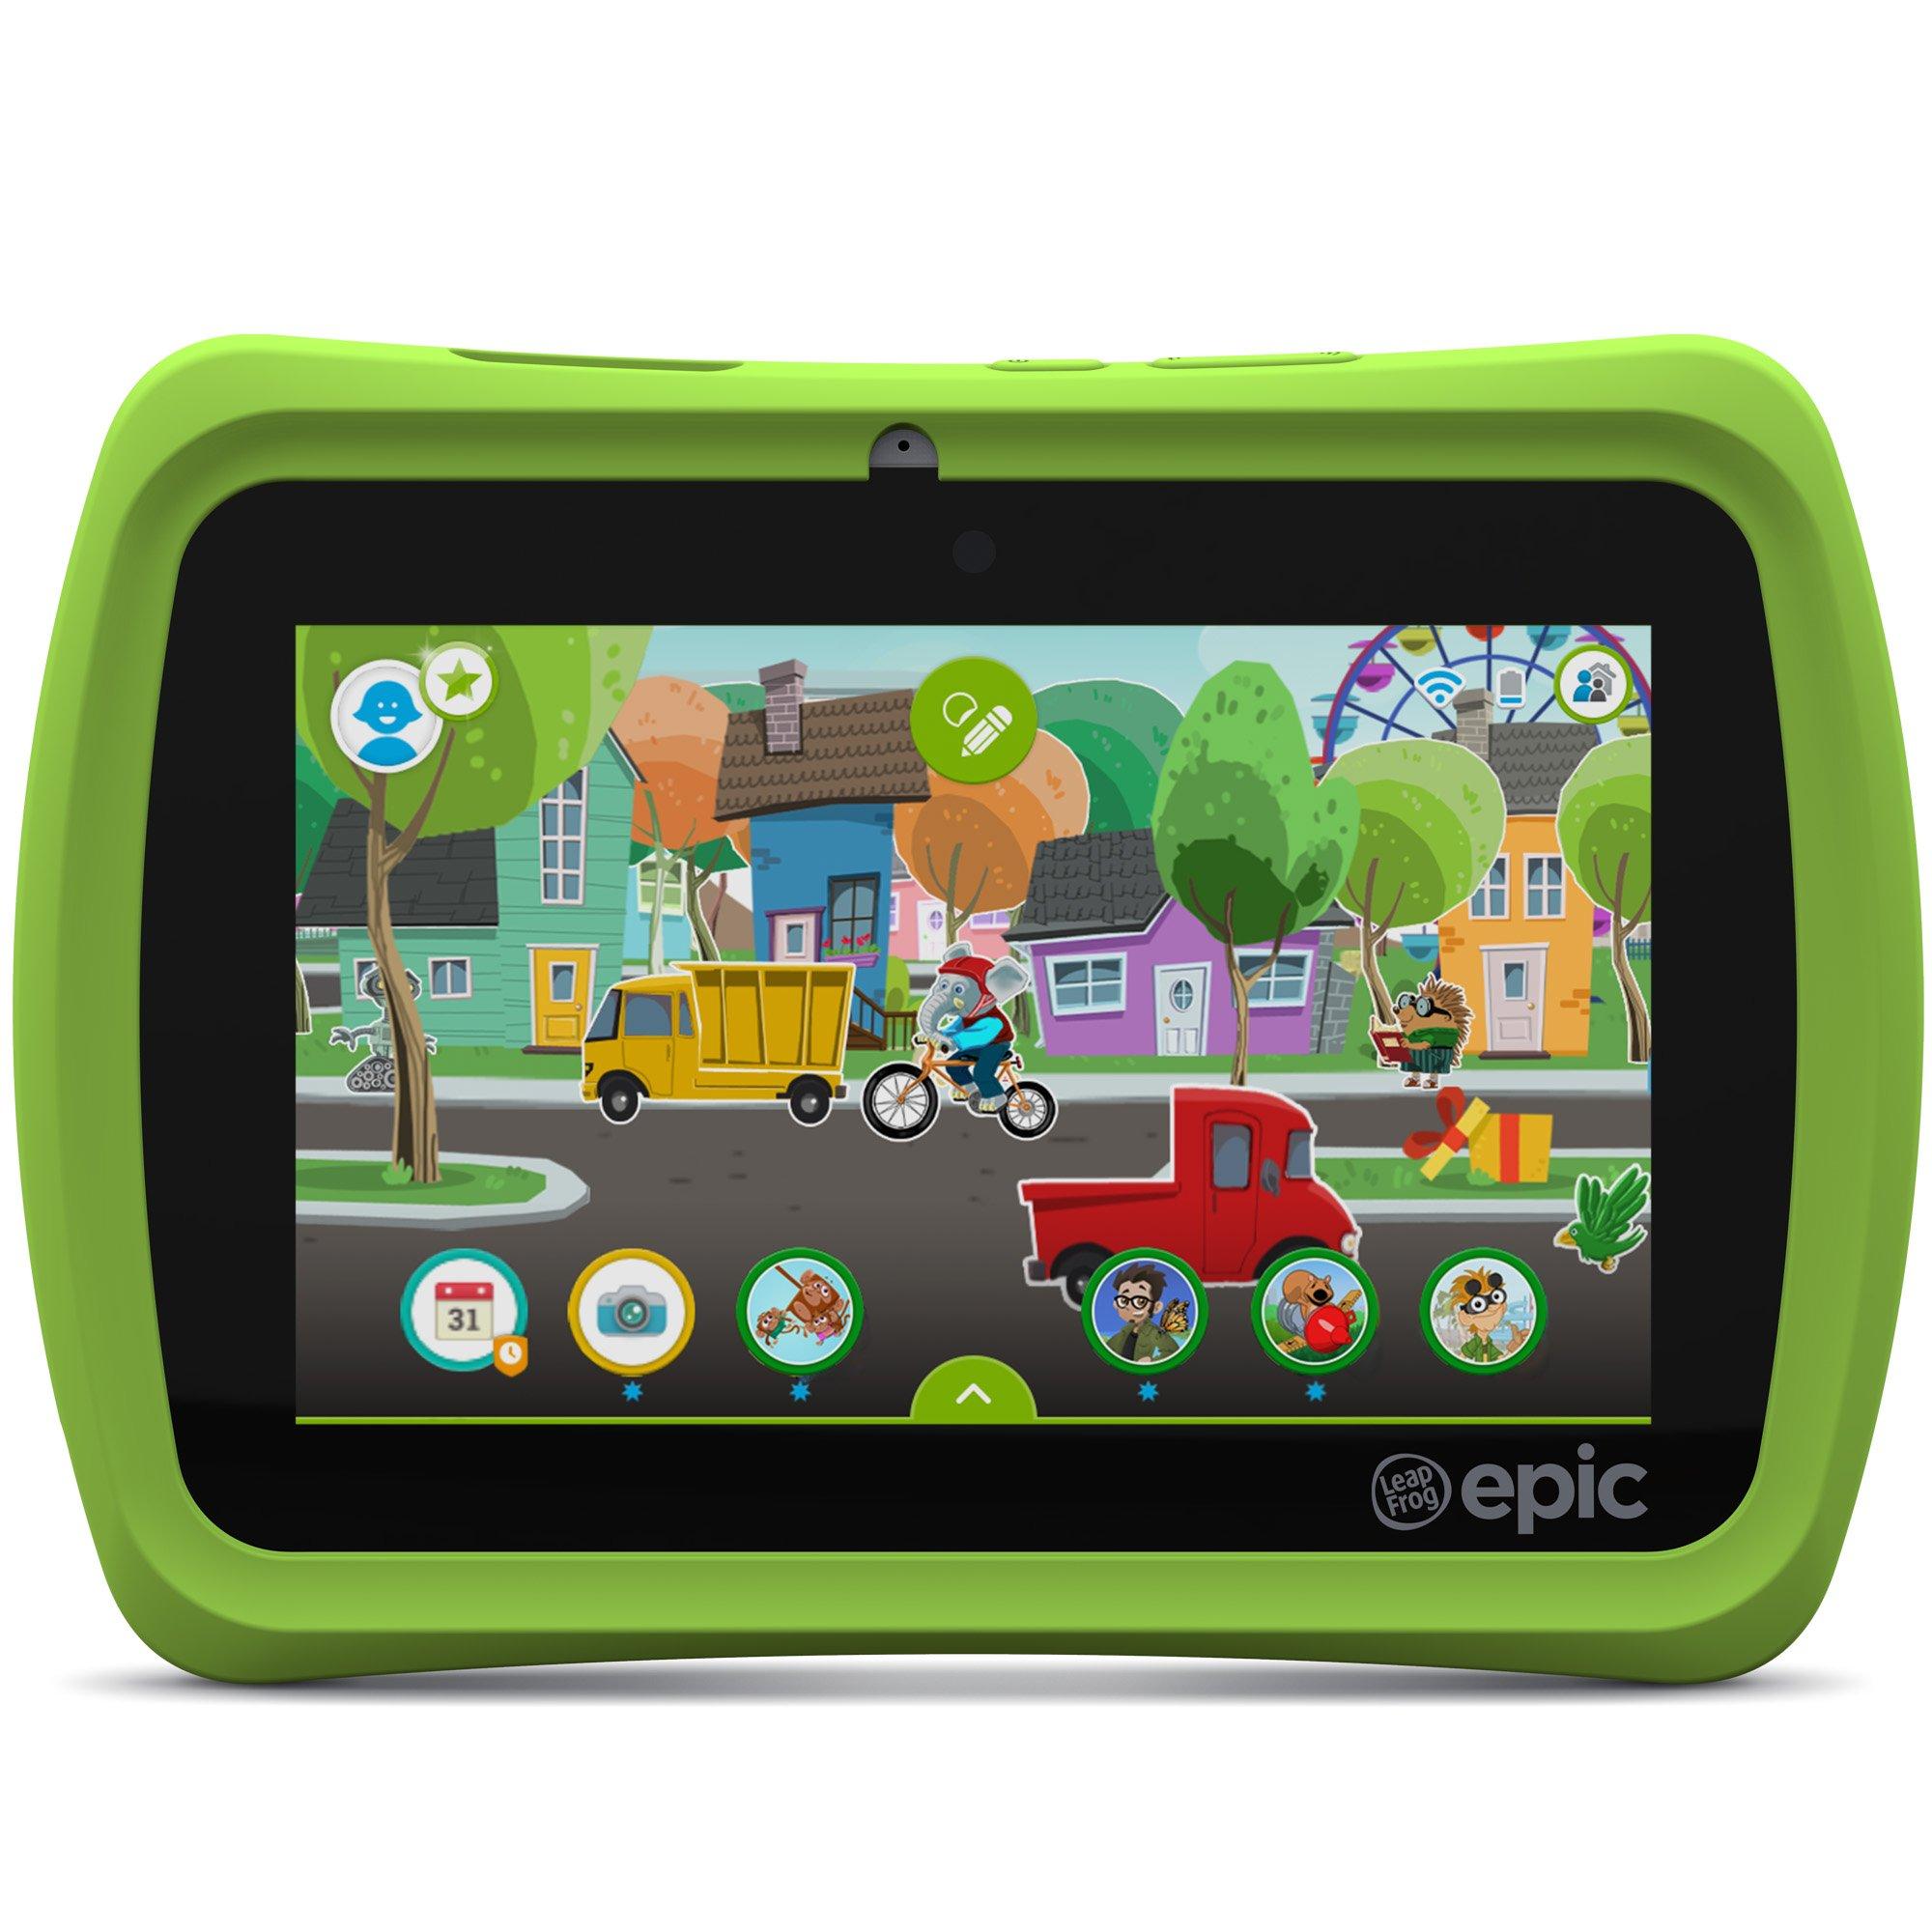 LeapFrog Epic 7'' Android-based Kids Tablet 16GB, Green